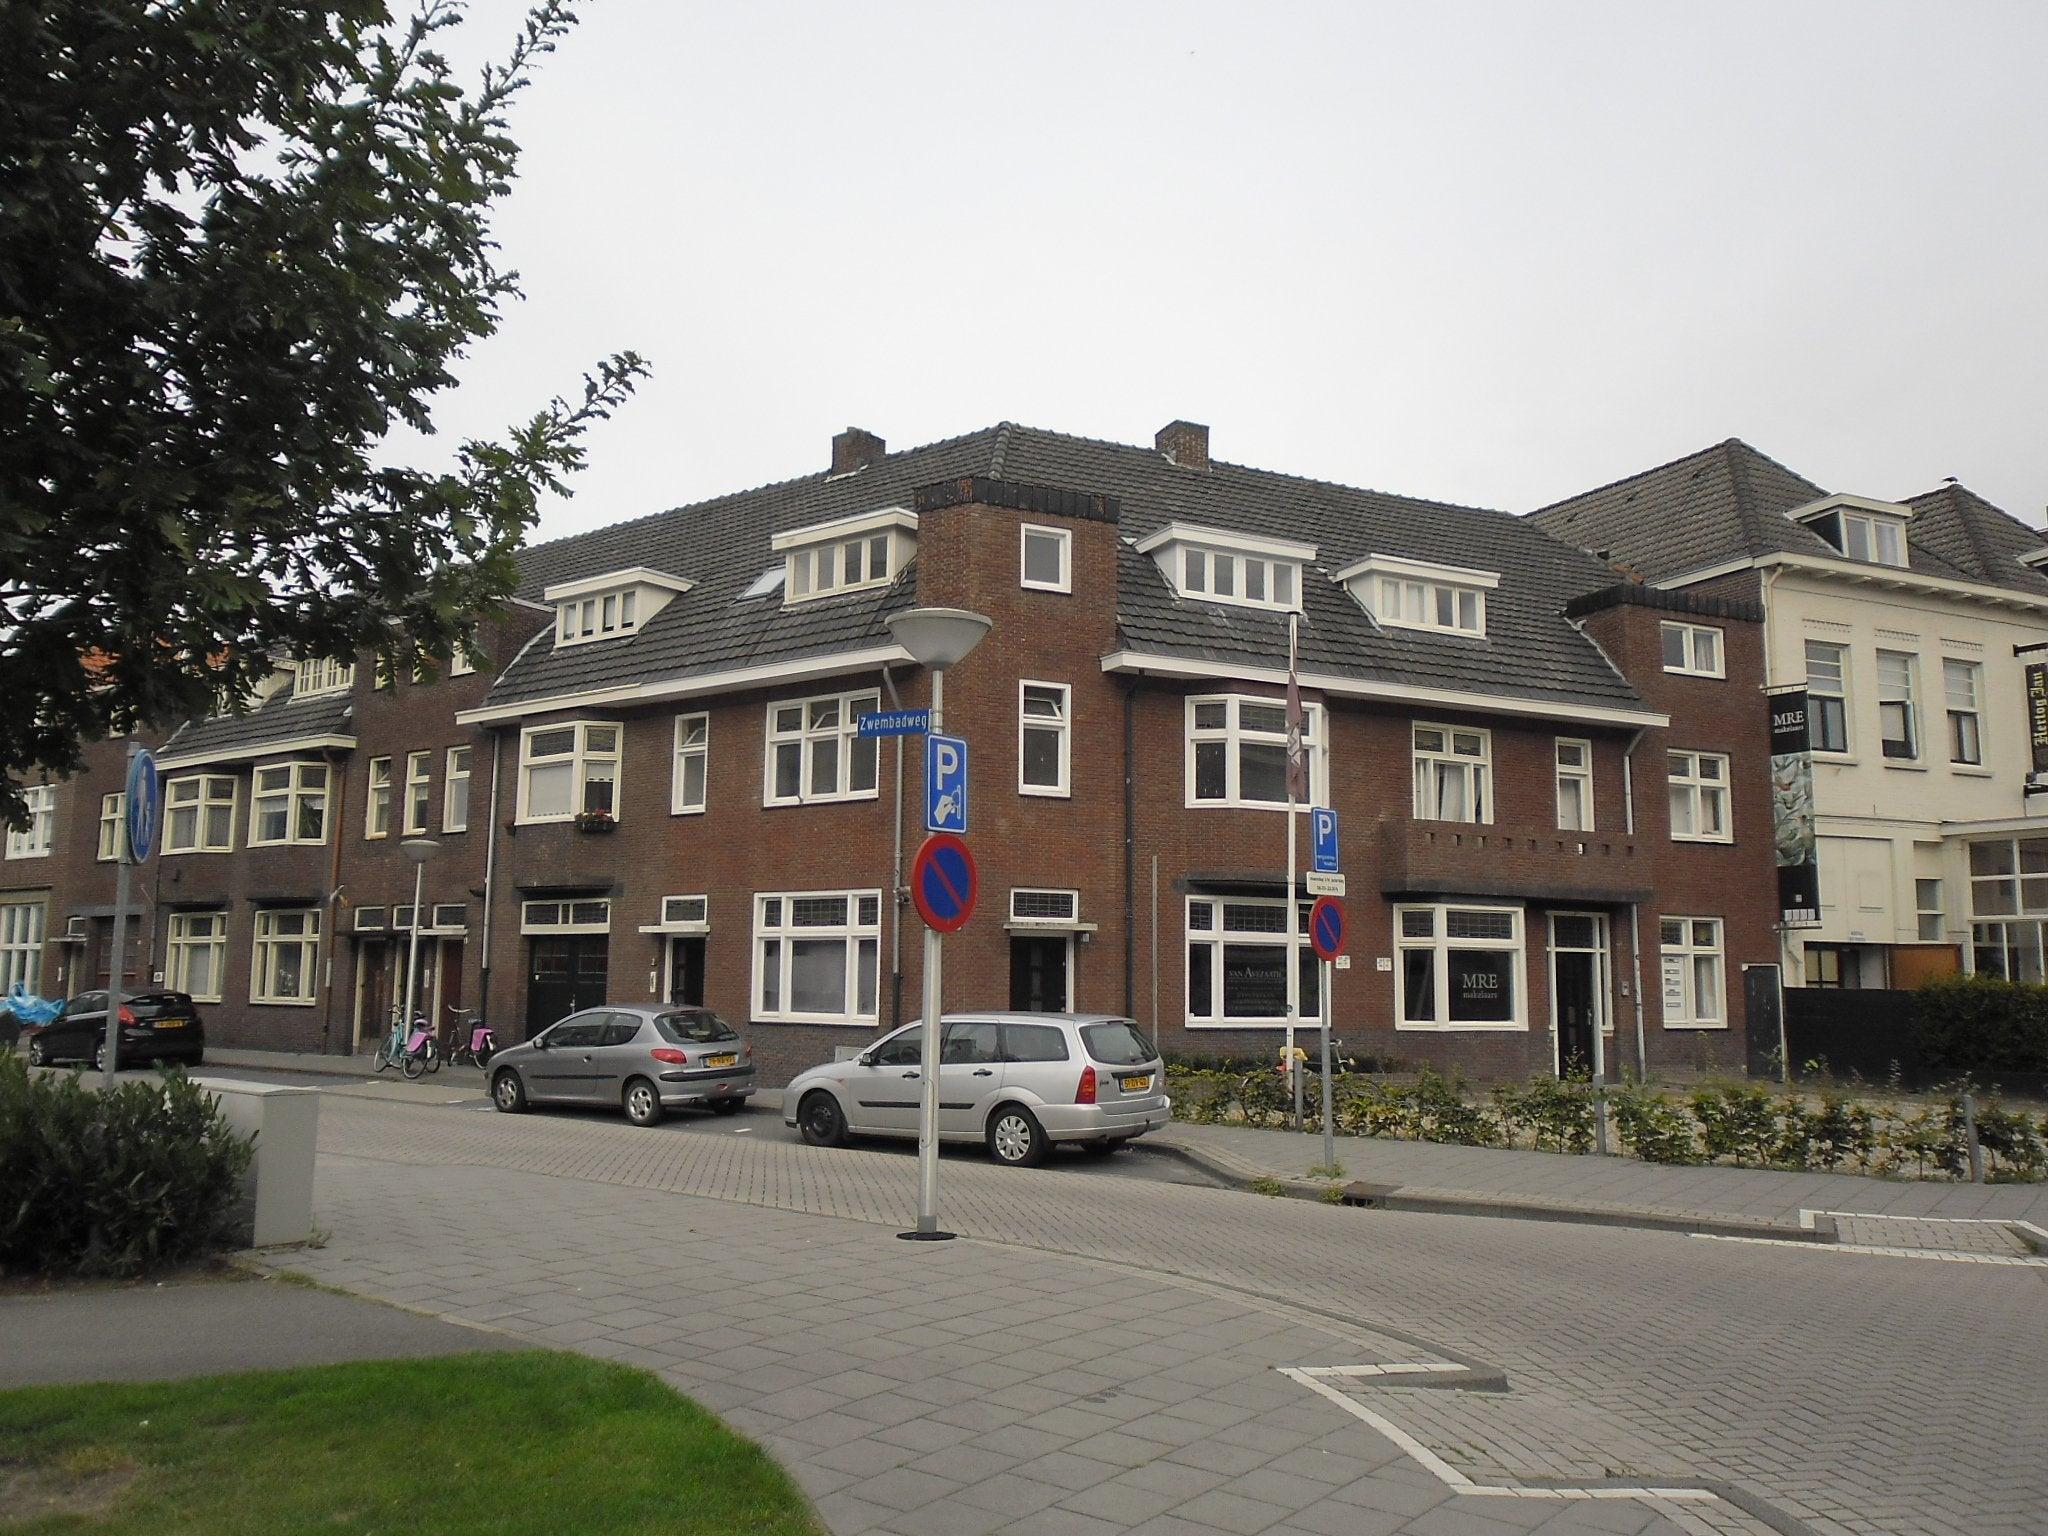 https://public.parariusoffice.nl/298/photos/huge/2717432.1516012114-923.JPG